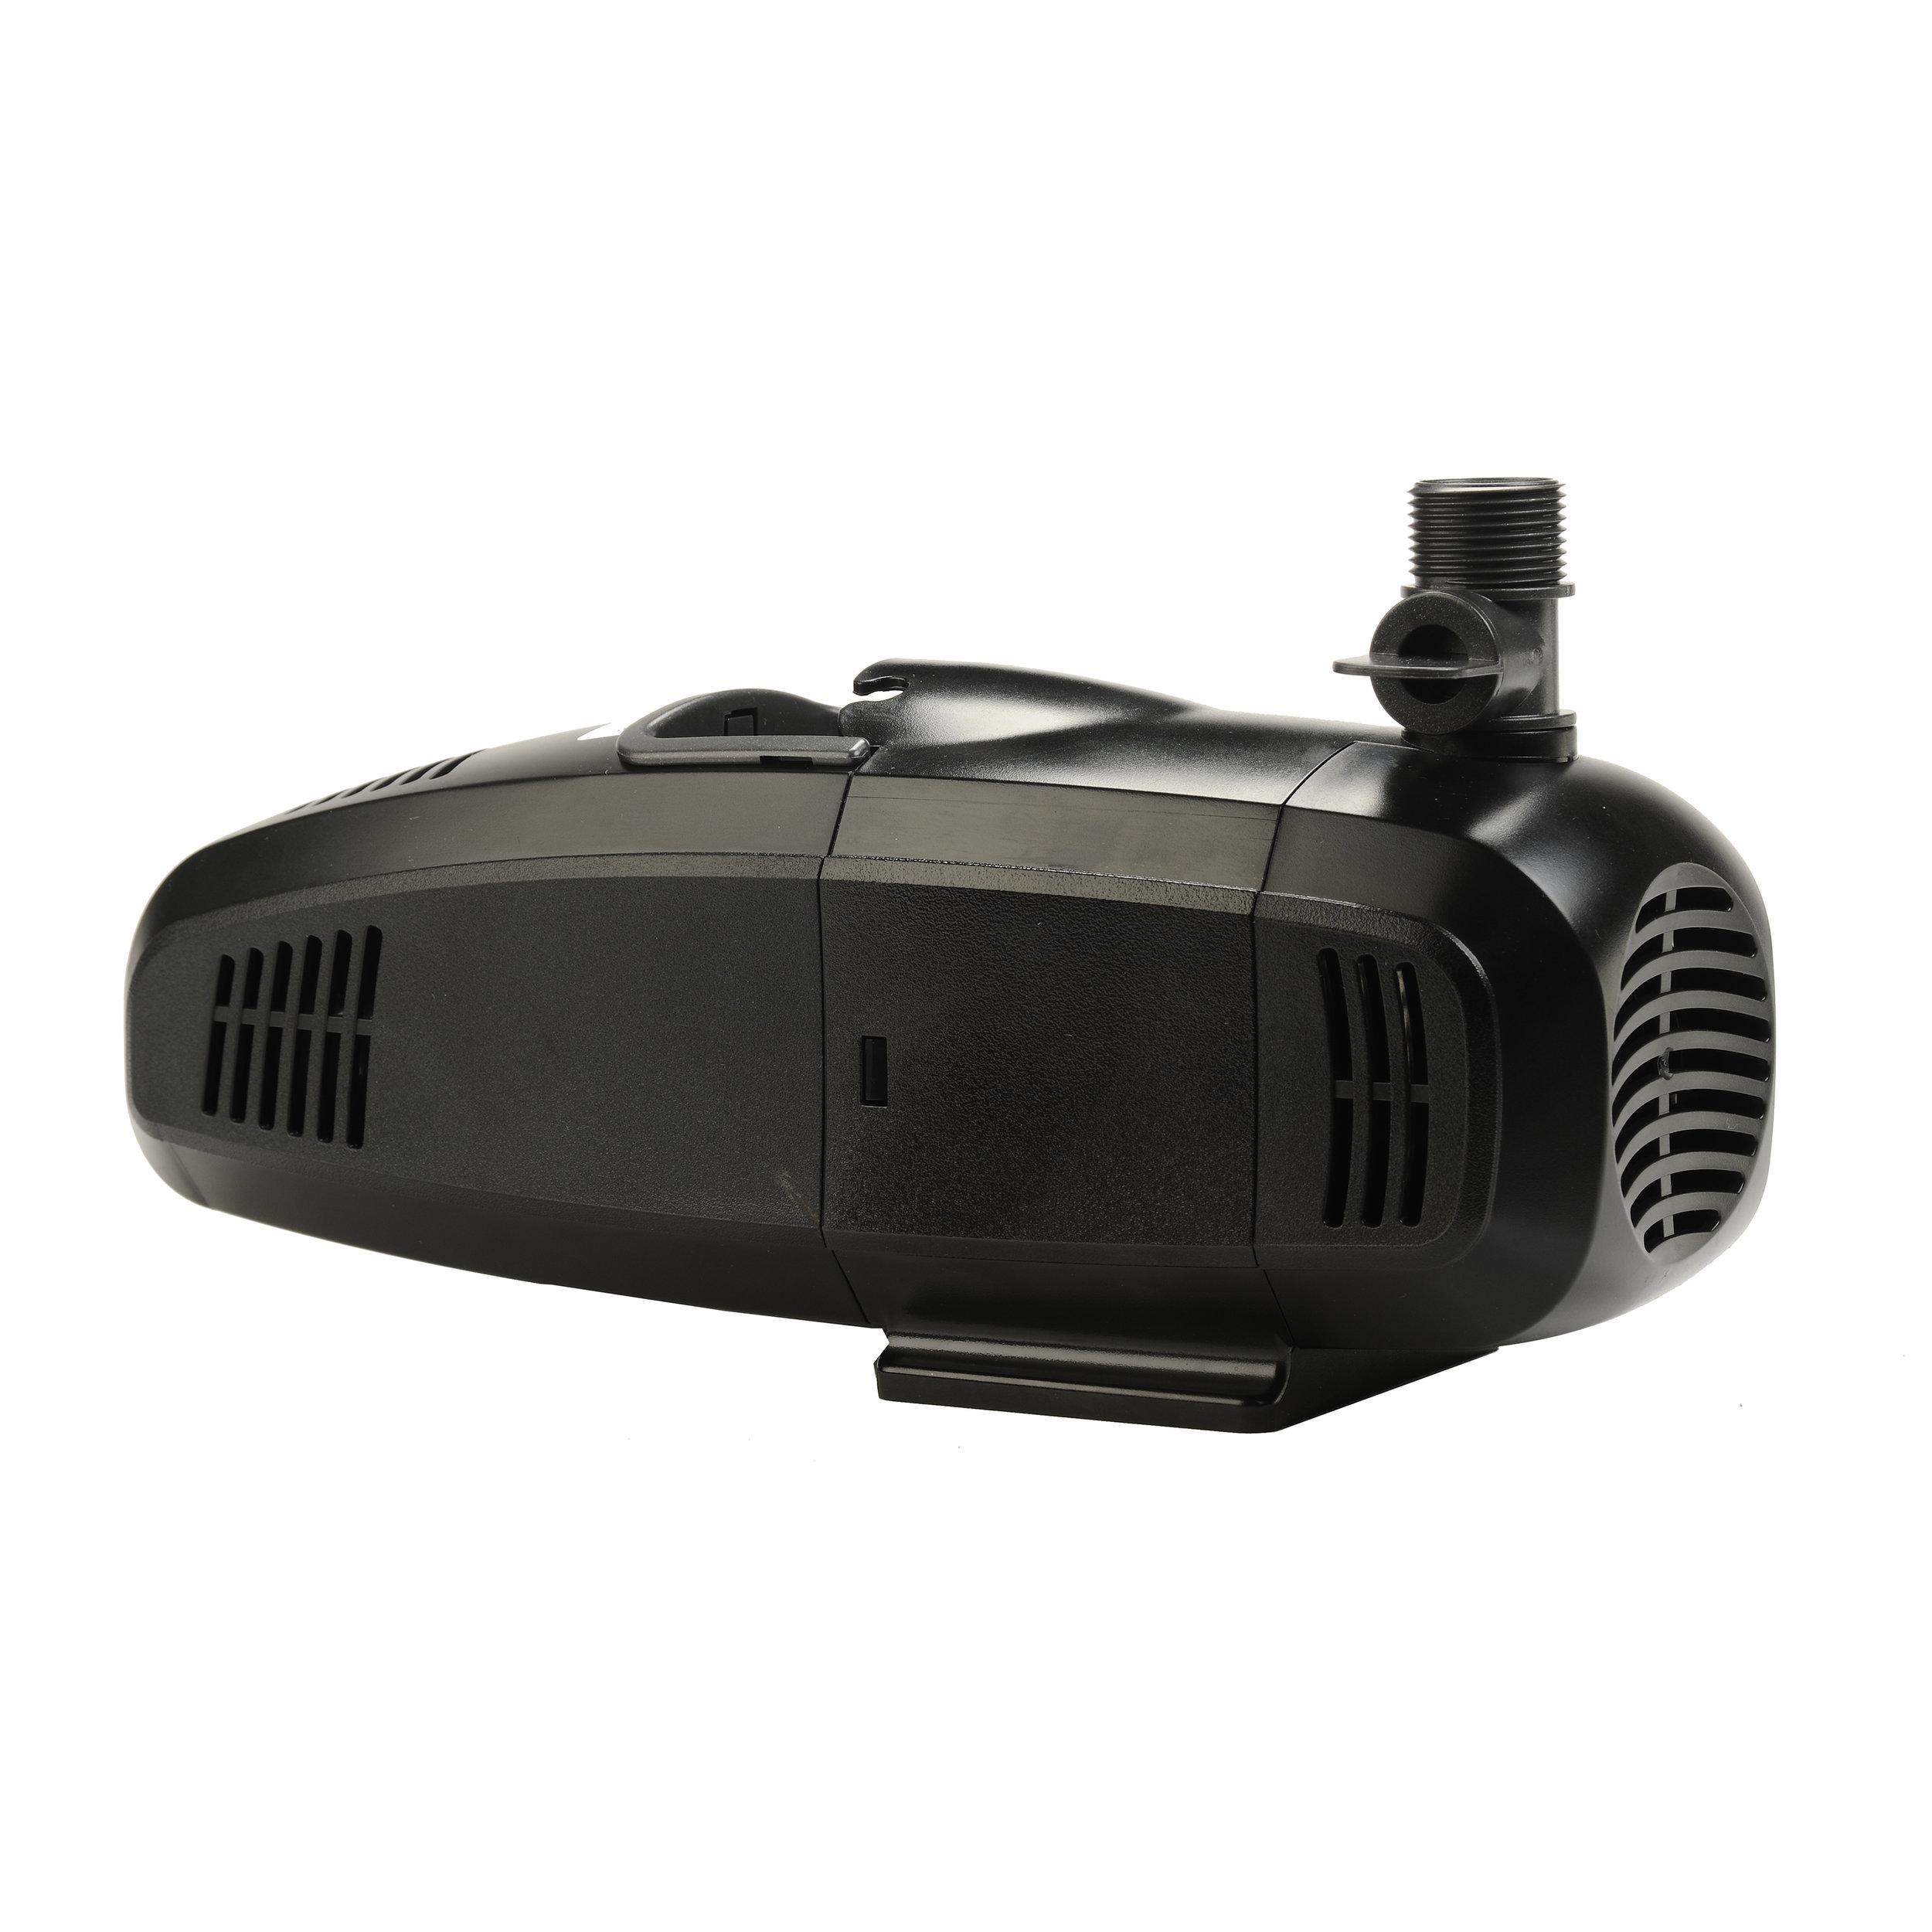 950 GPH Pump with UV